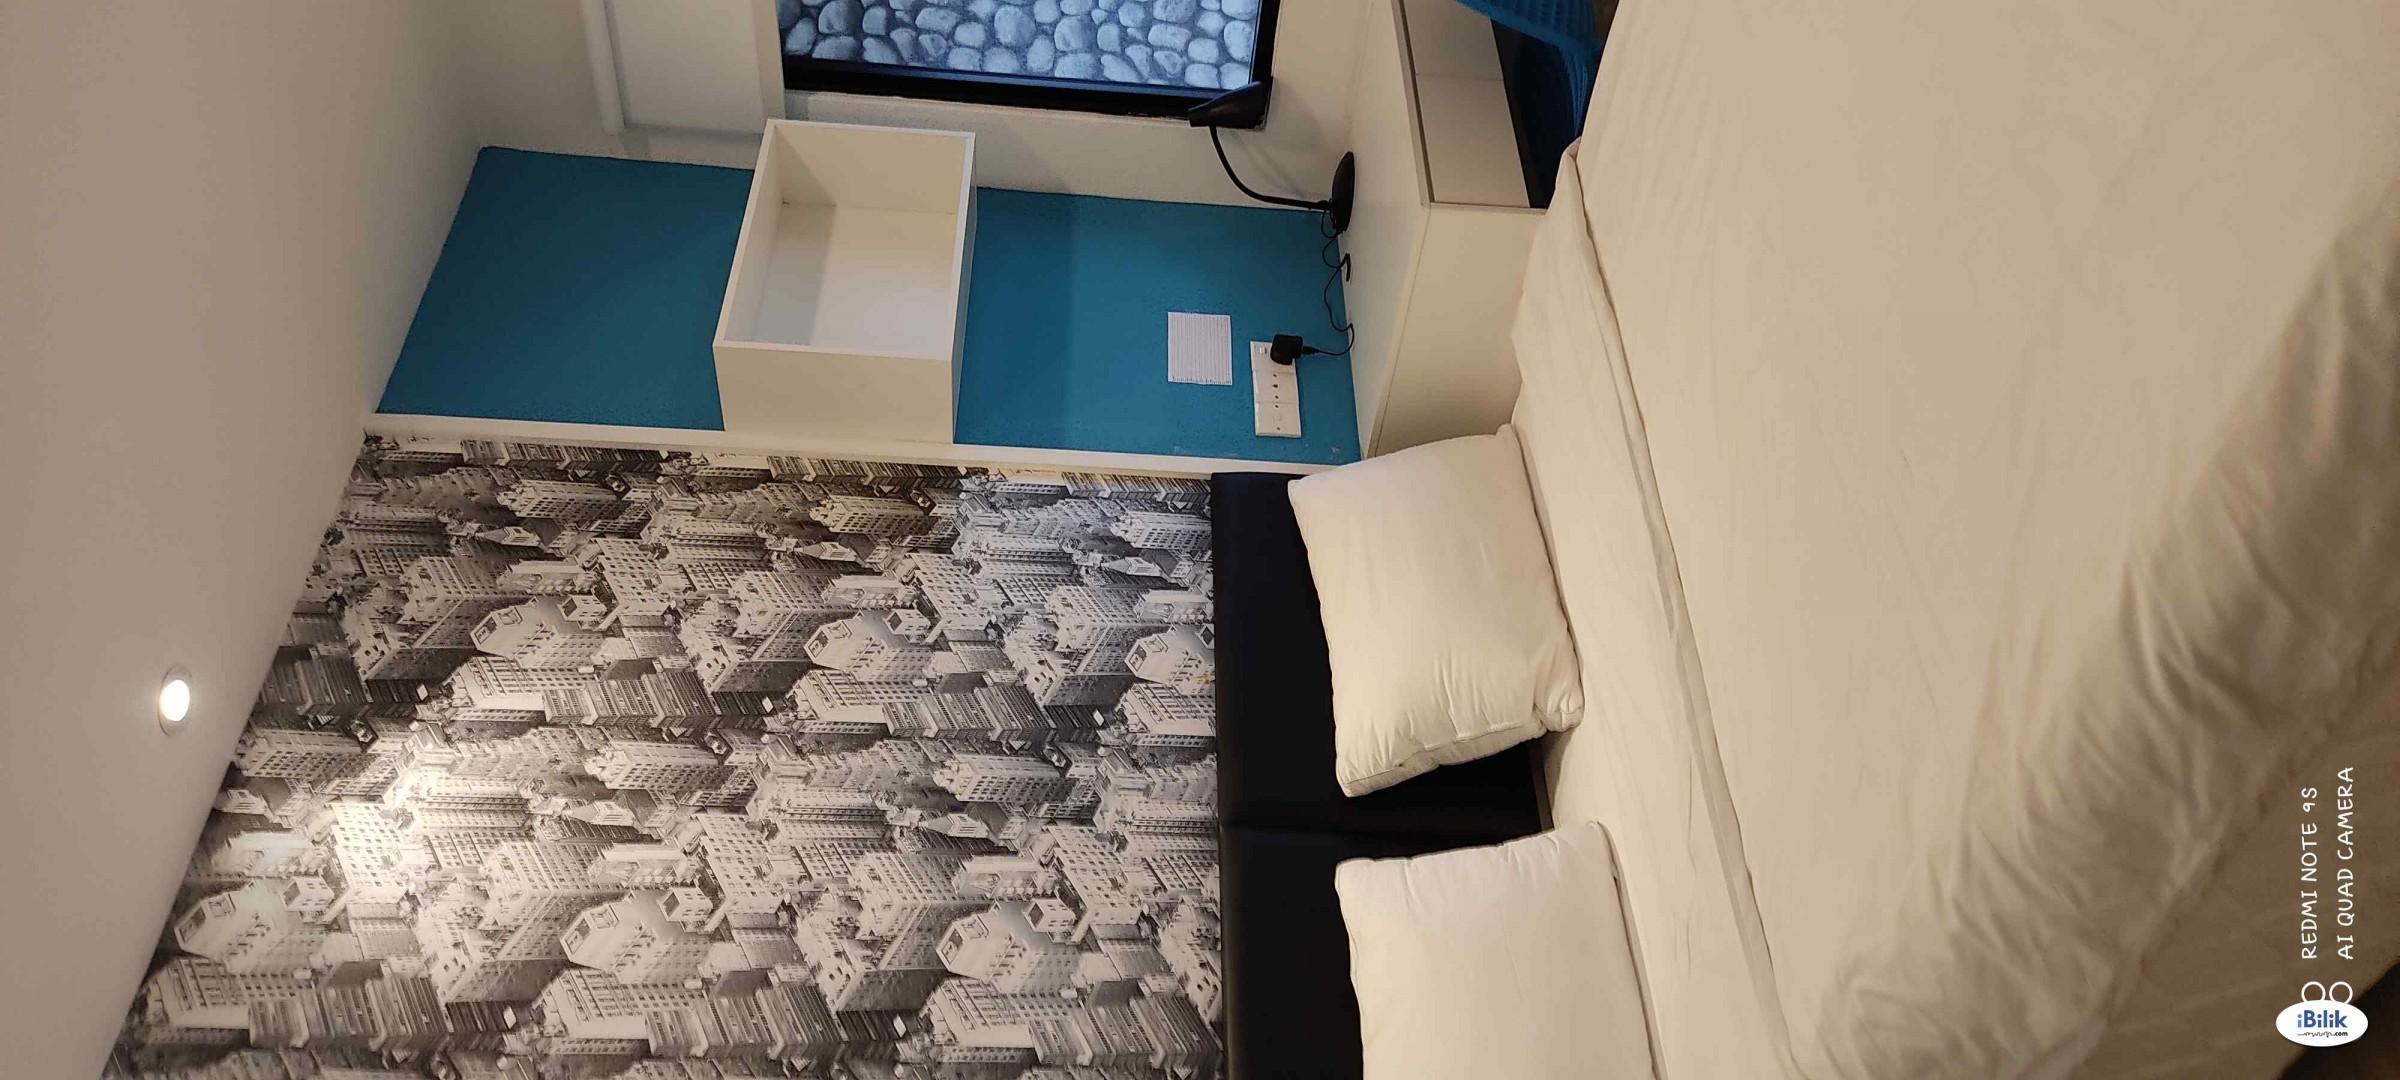 Single Room at Bandar Sunway, Petaling Jaya